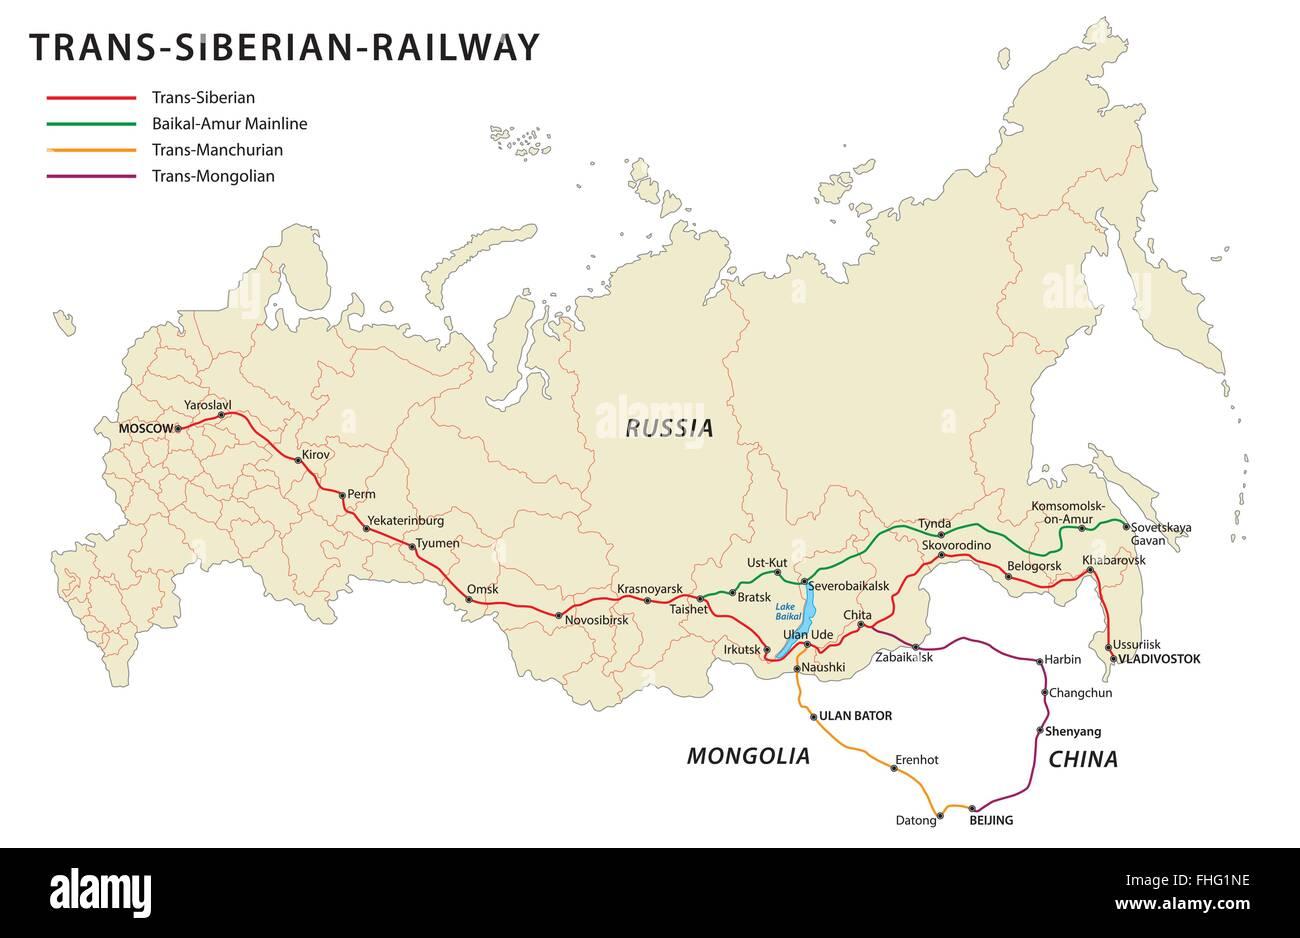 Trans-siberian-railway map - Stock Image